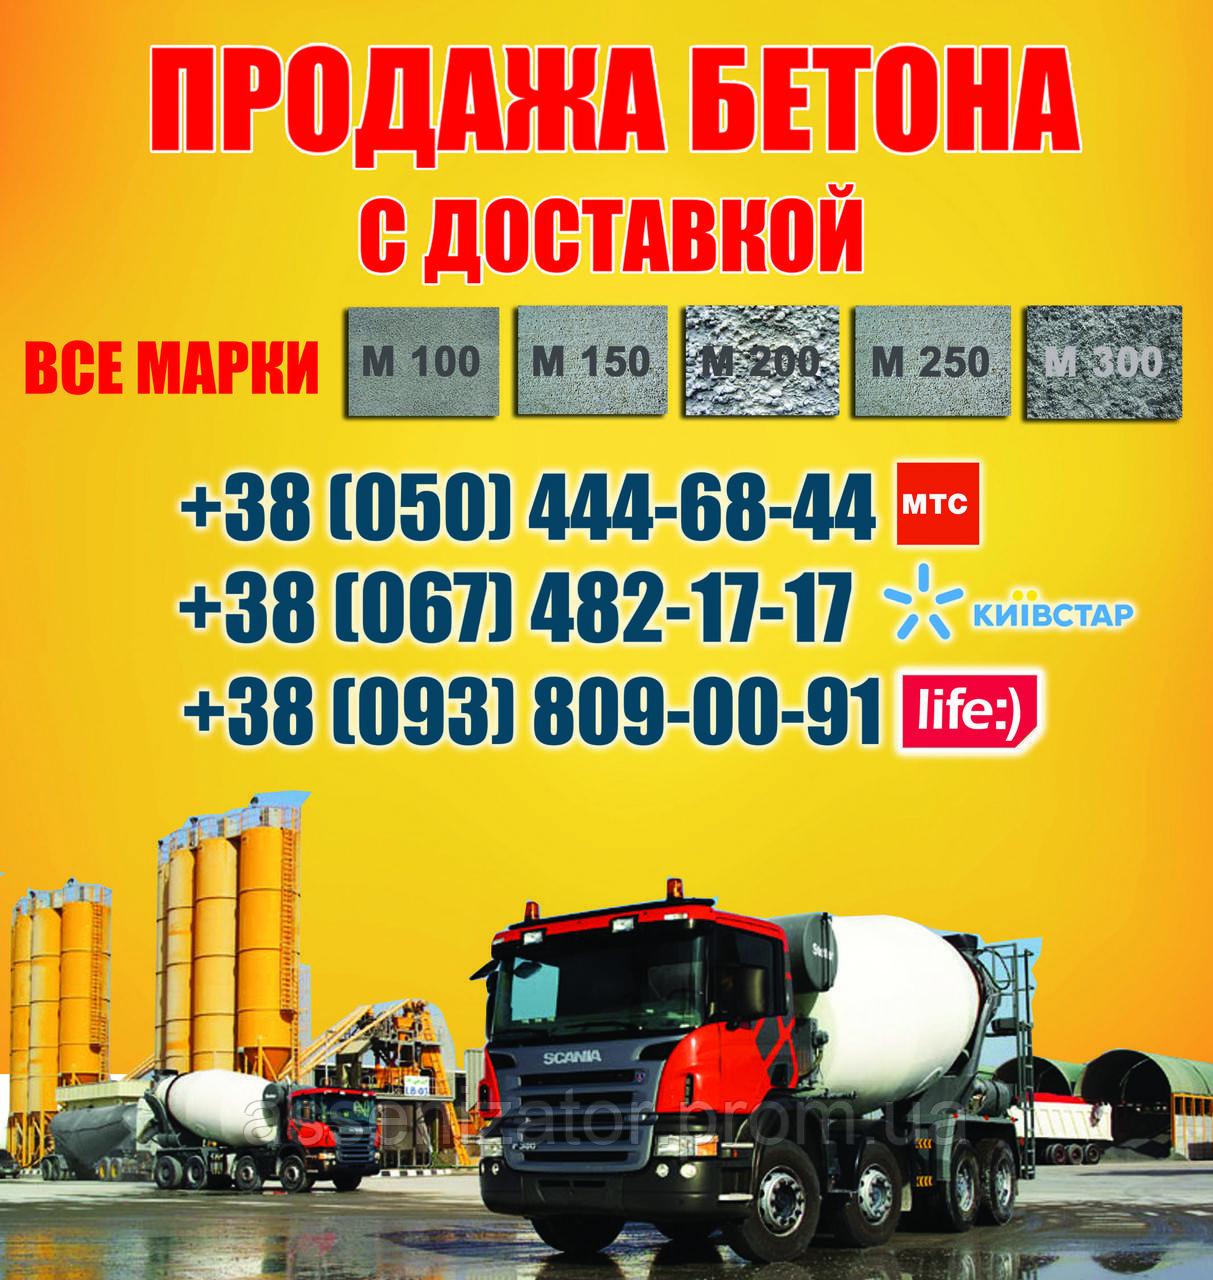 Купить бетон в Днепропетровске. Цена за куб по Днепропетровску. Купить с доставкой бетон ДНЕПРОПЕТРОВСК